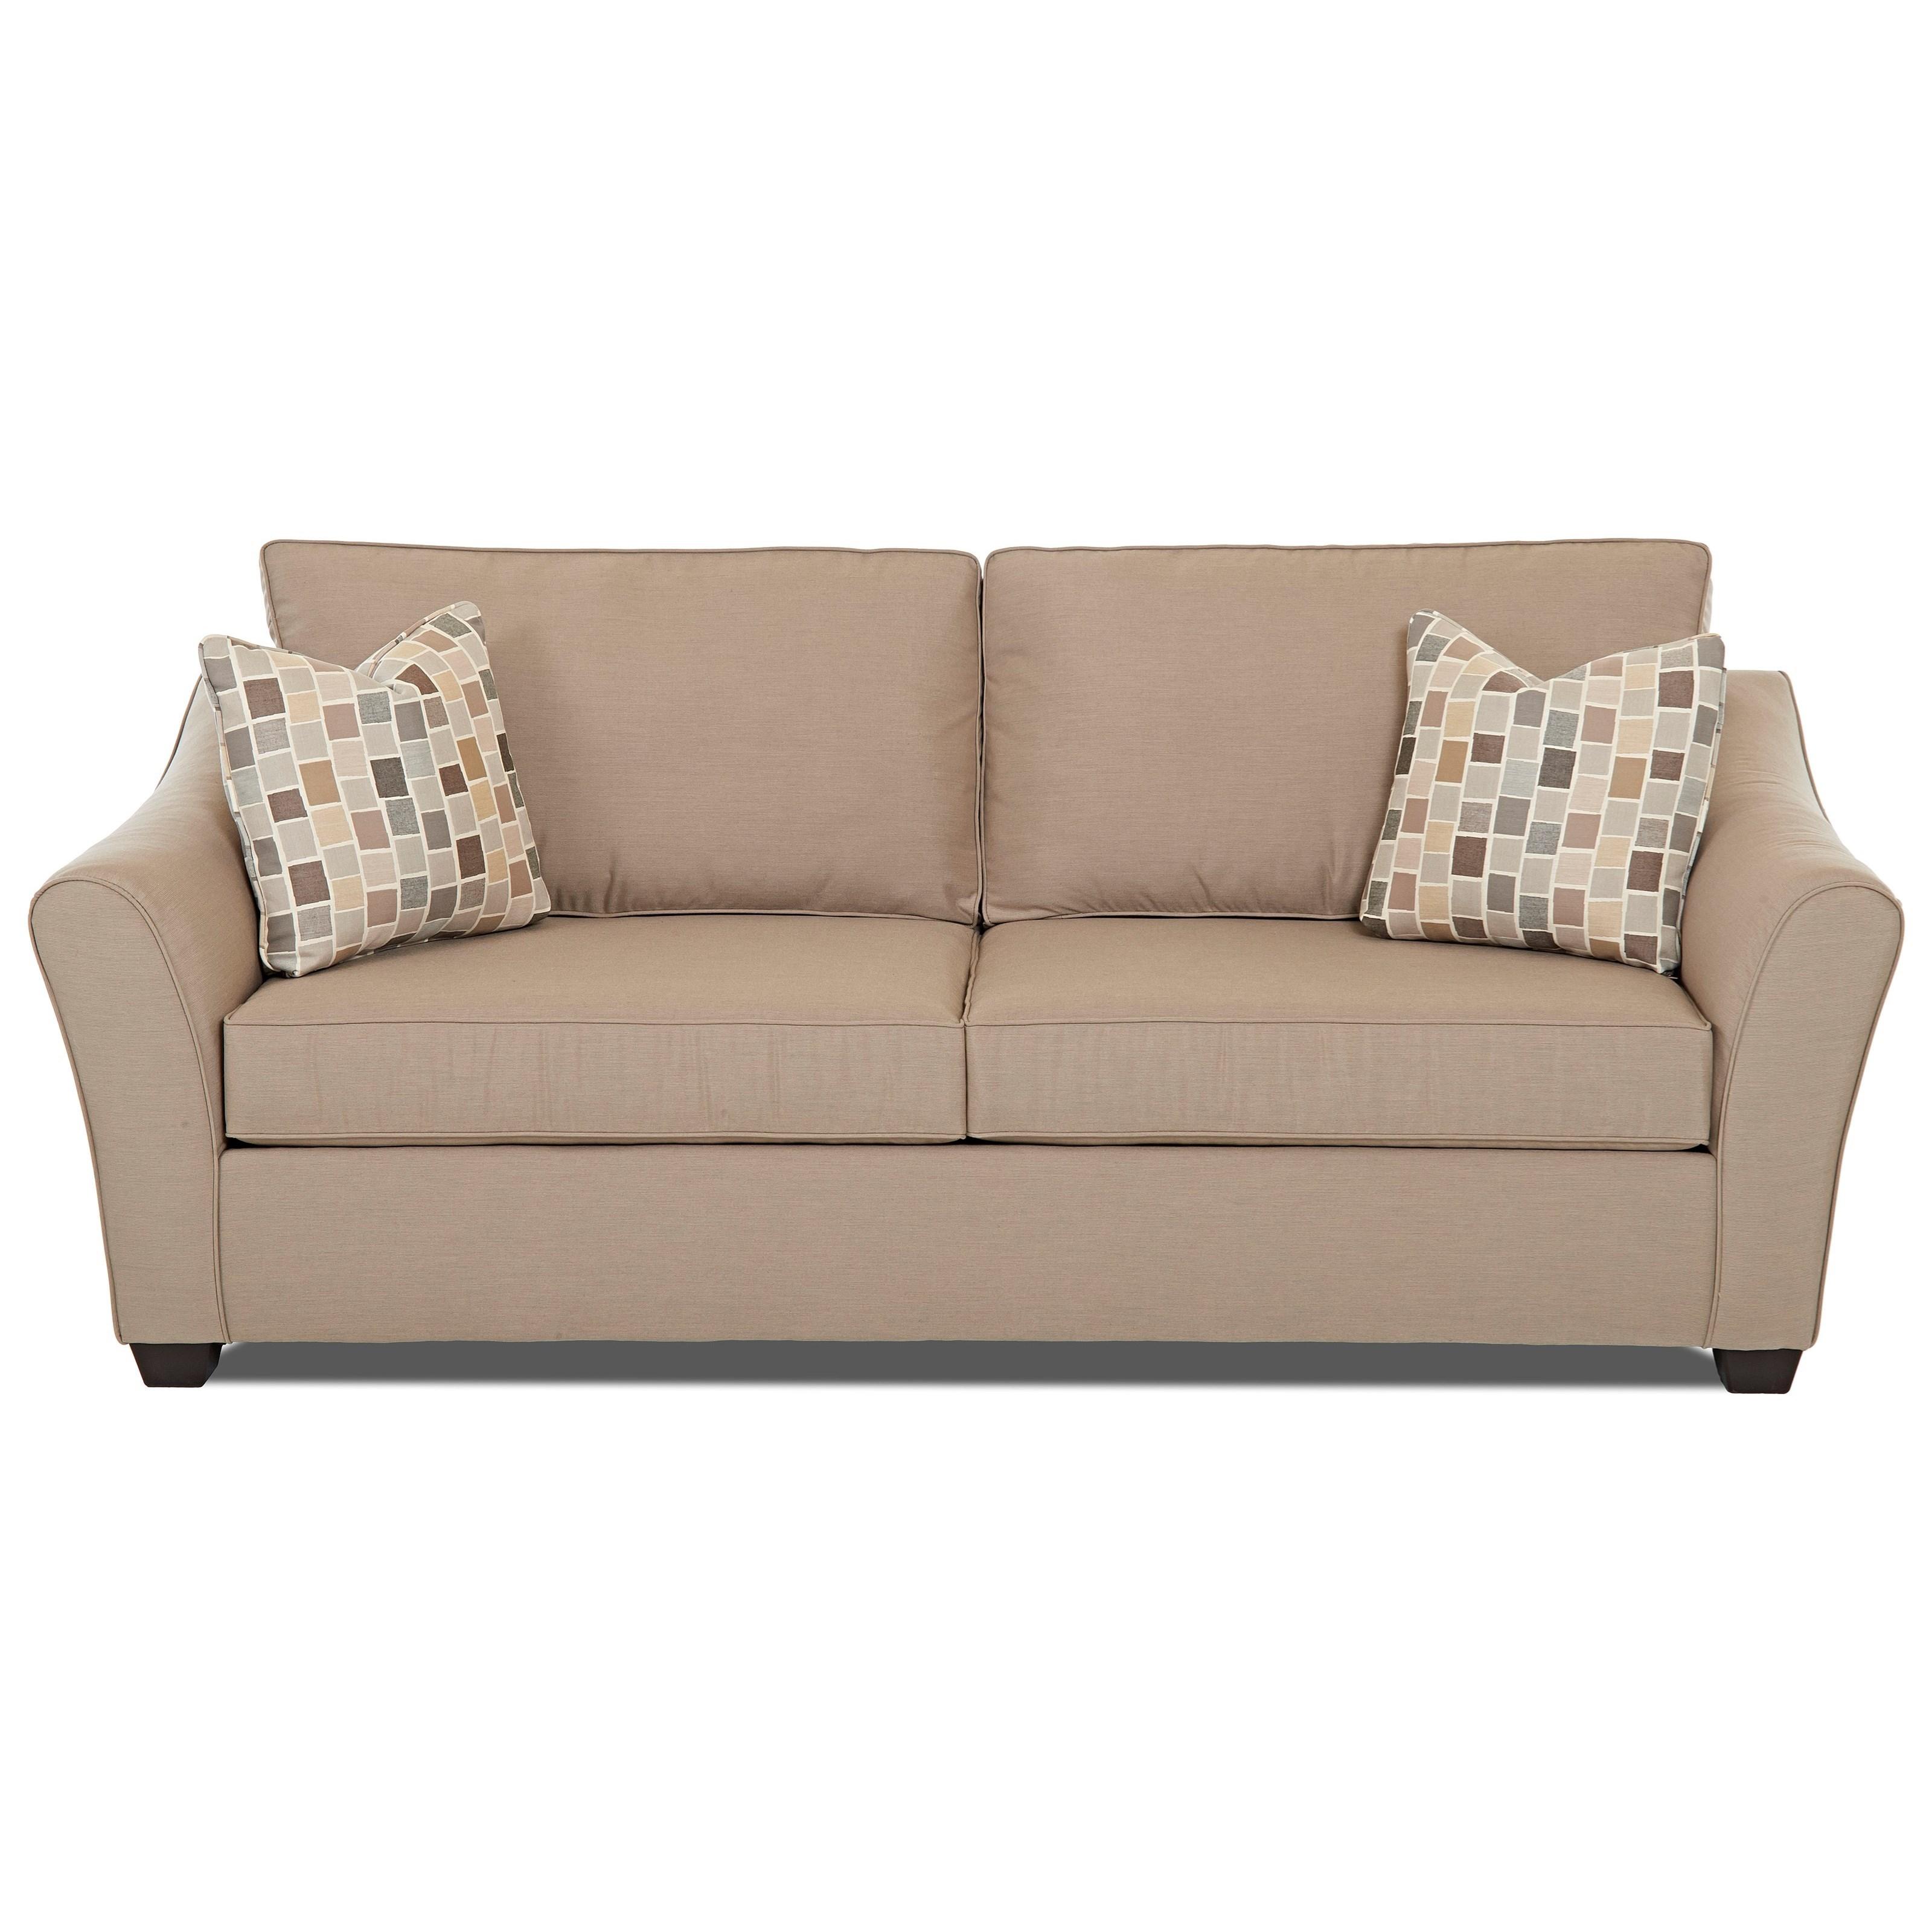 Klaussner Linville Sofa - Item Number: K80400 S-48031-0000